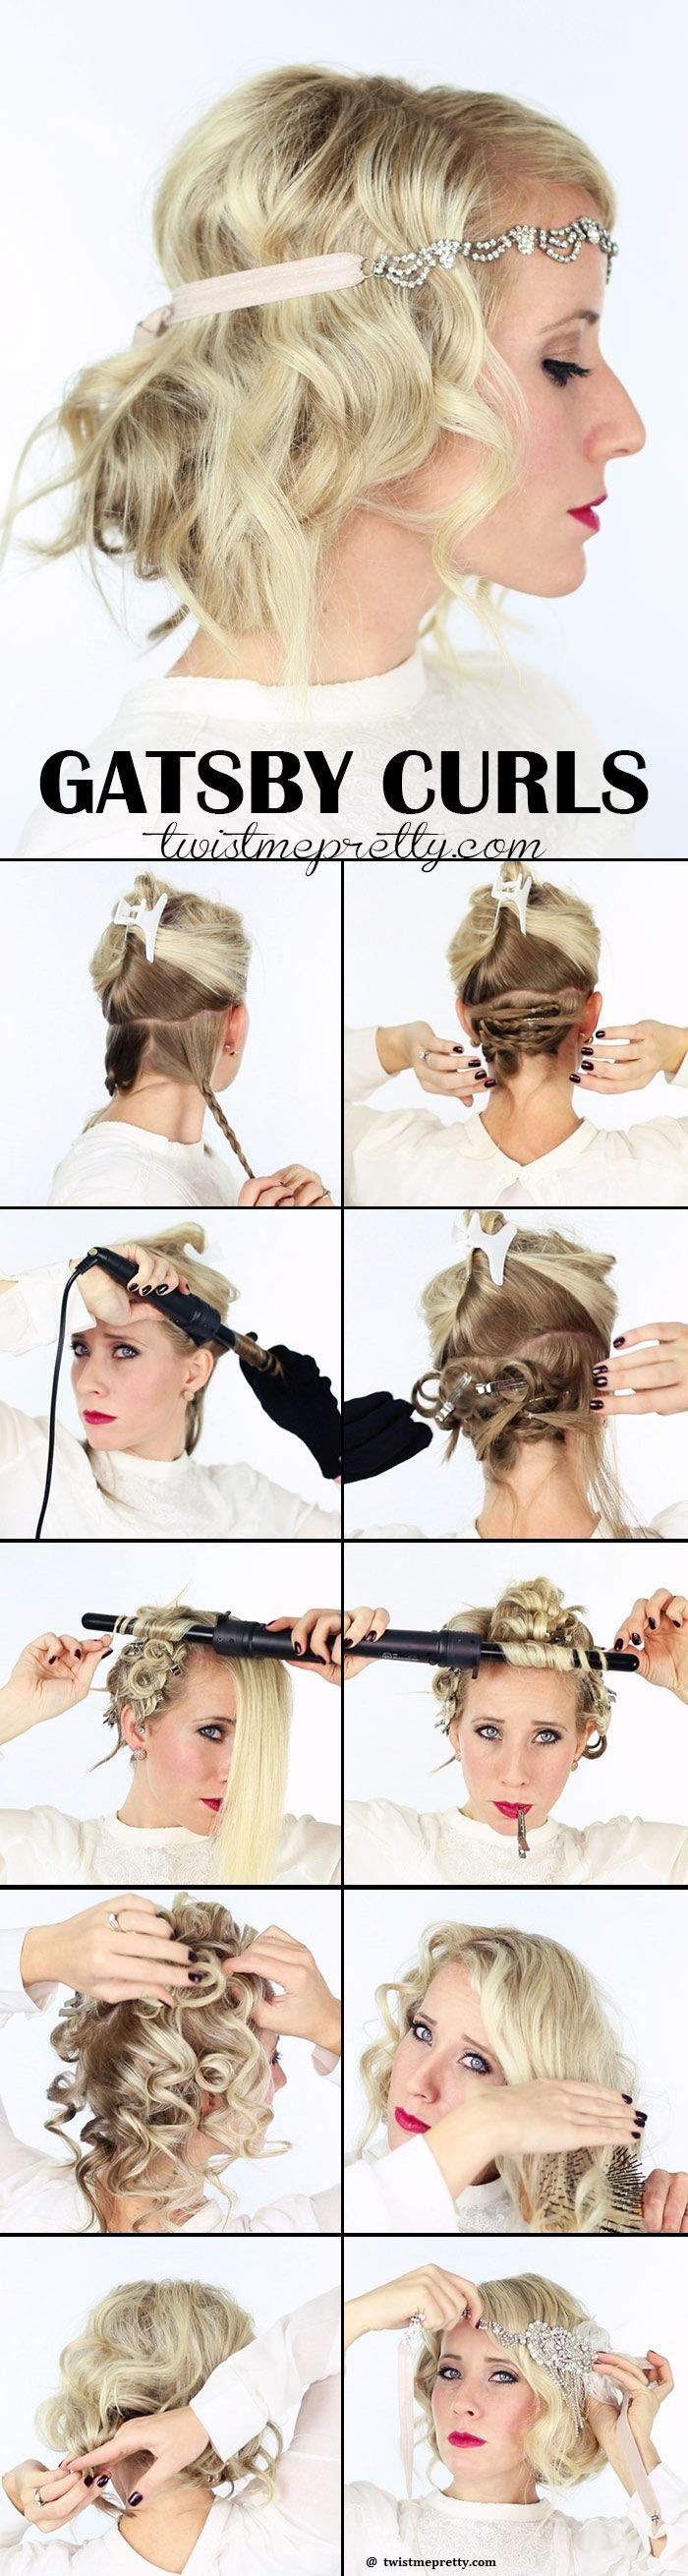 coiffure-soirée-12